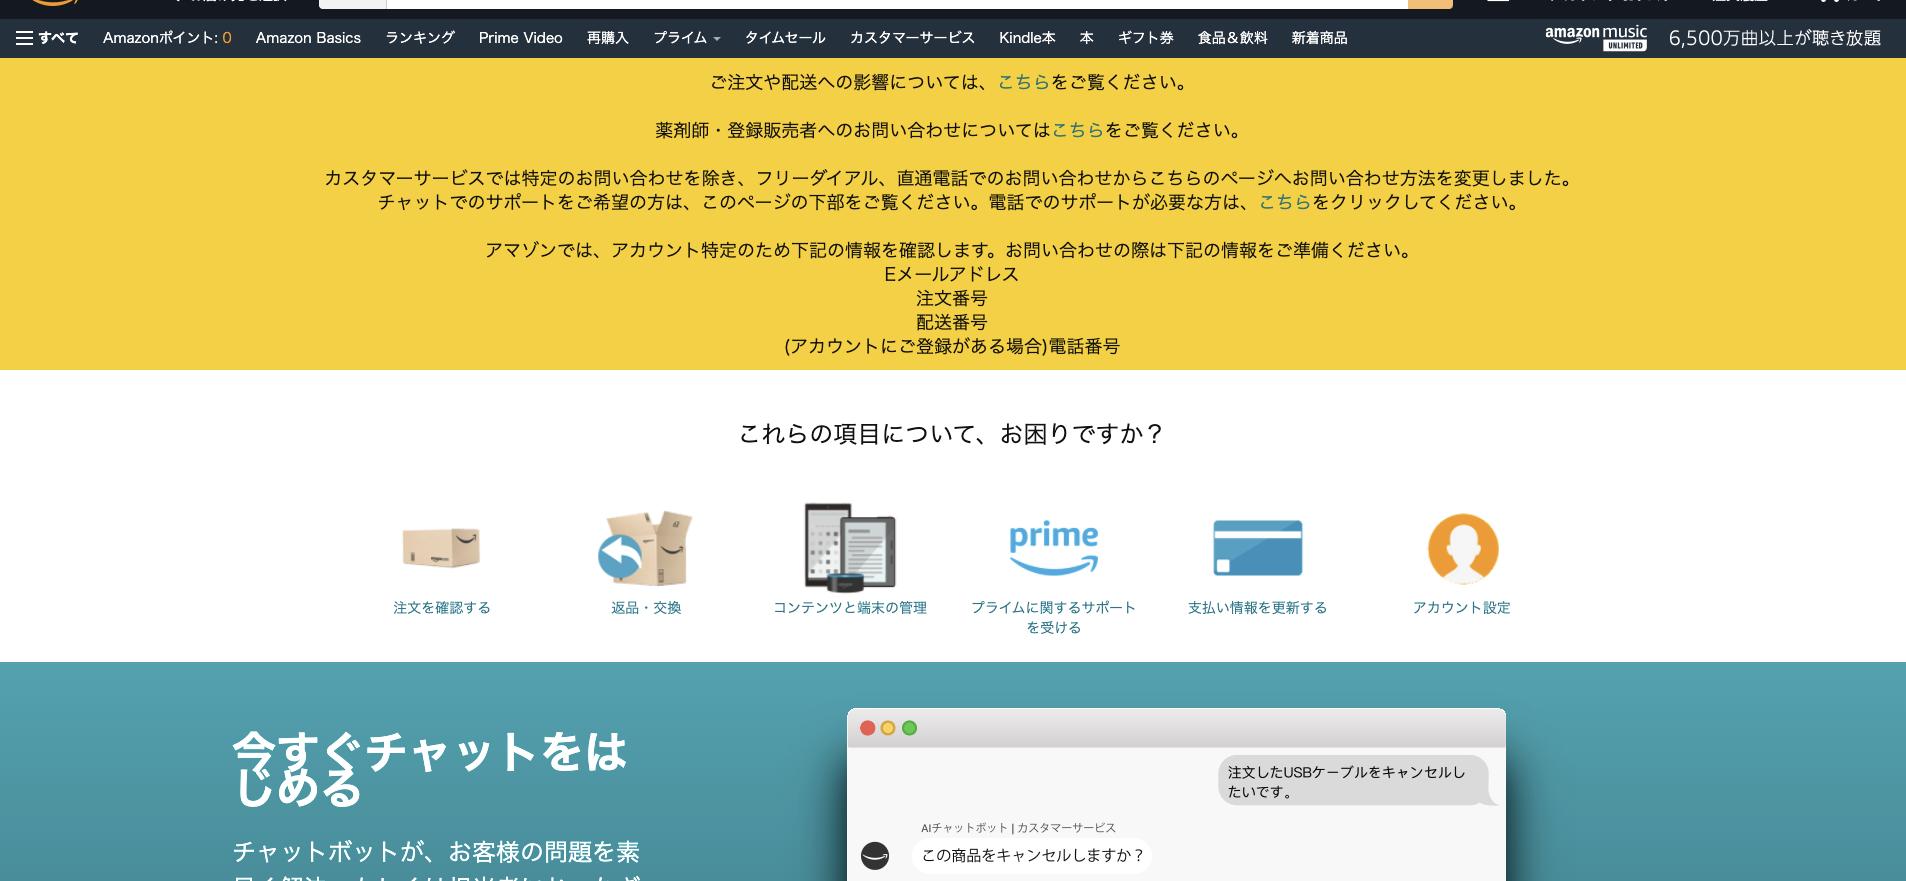 Amazonお問い合わせページ